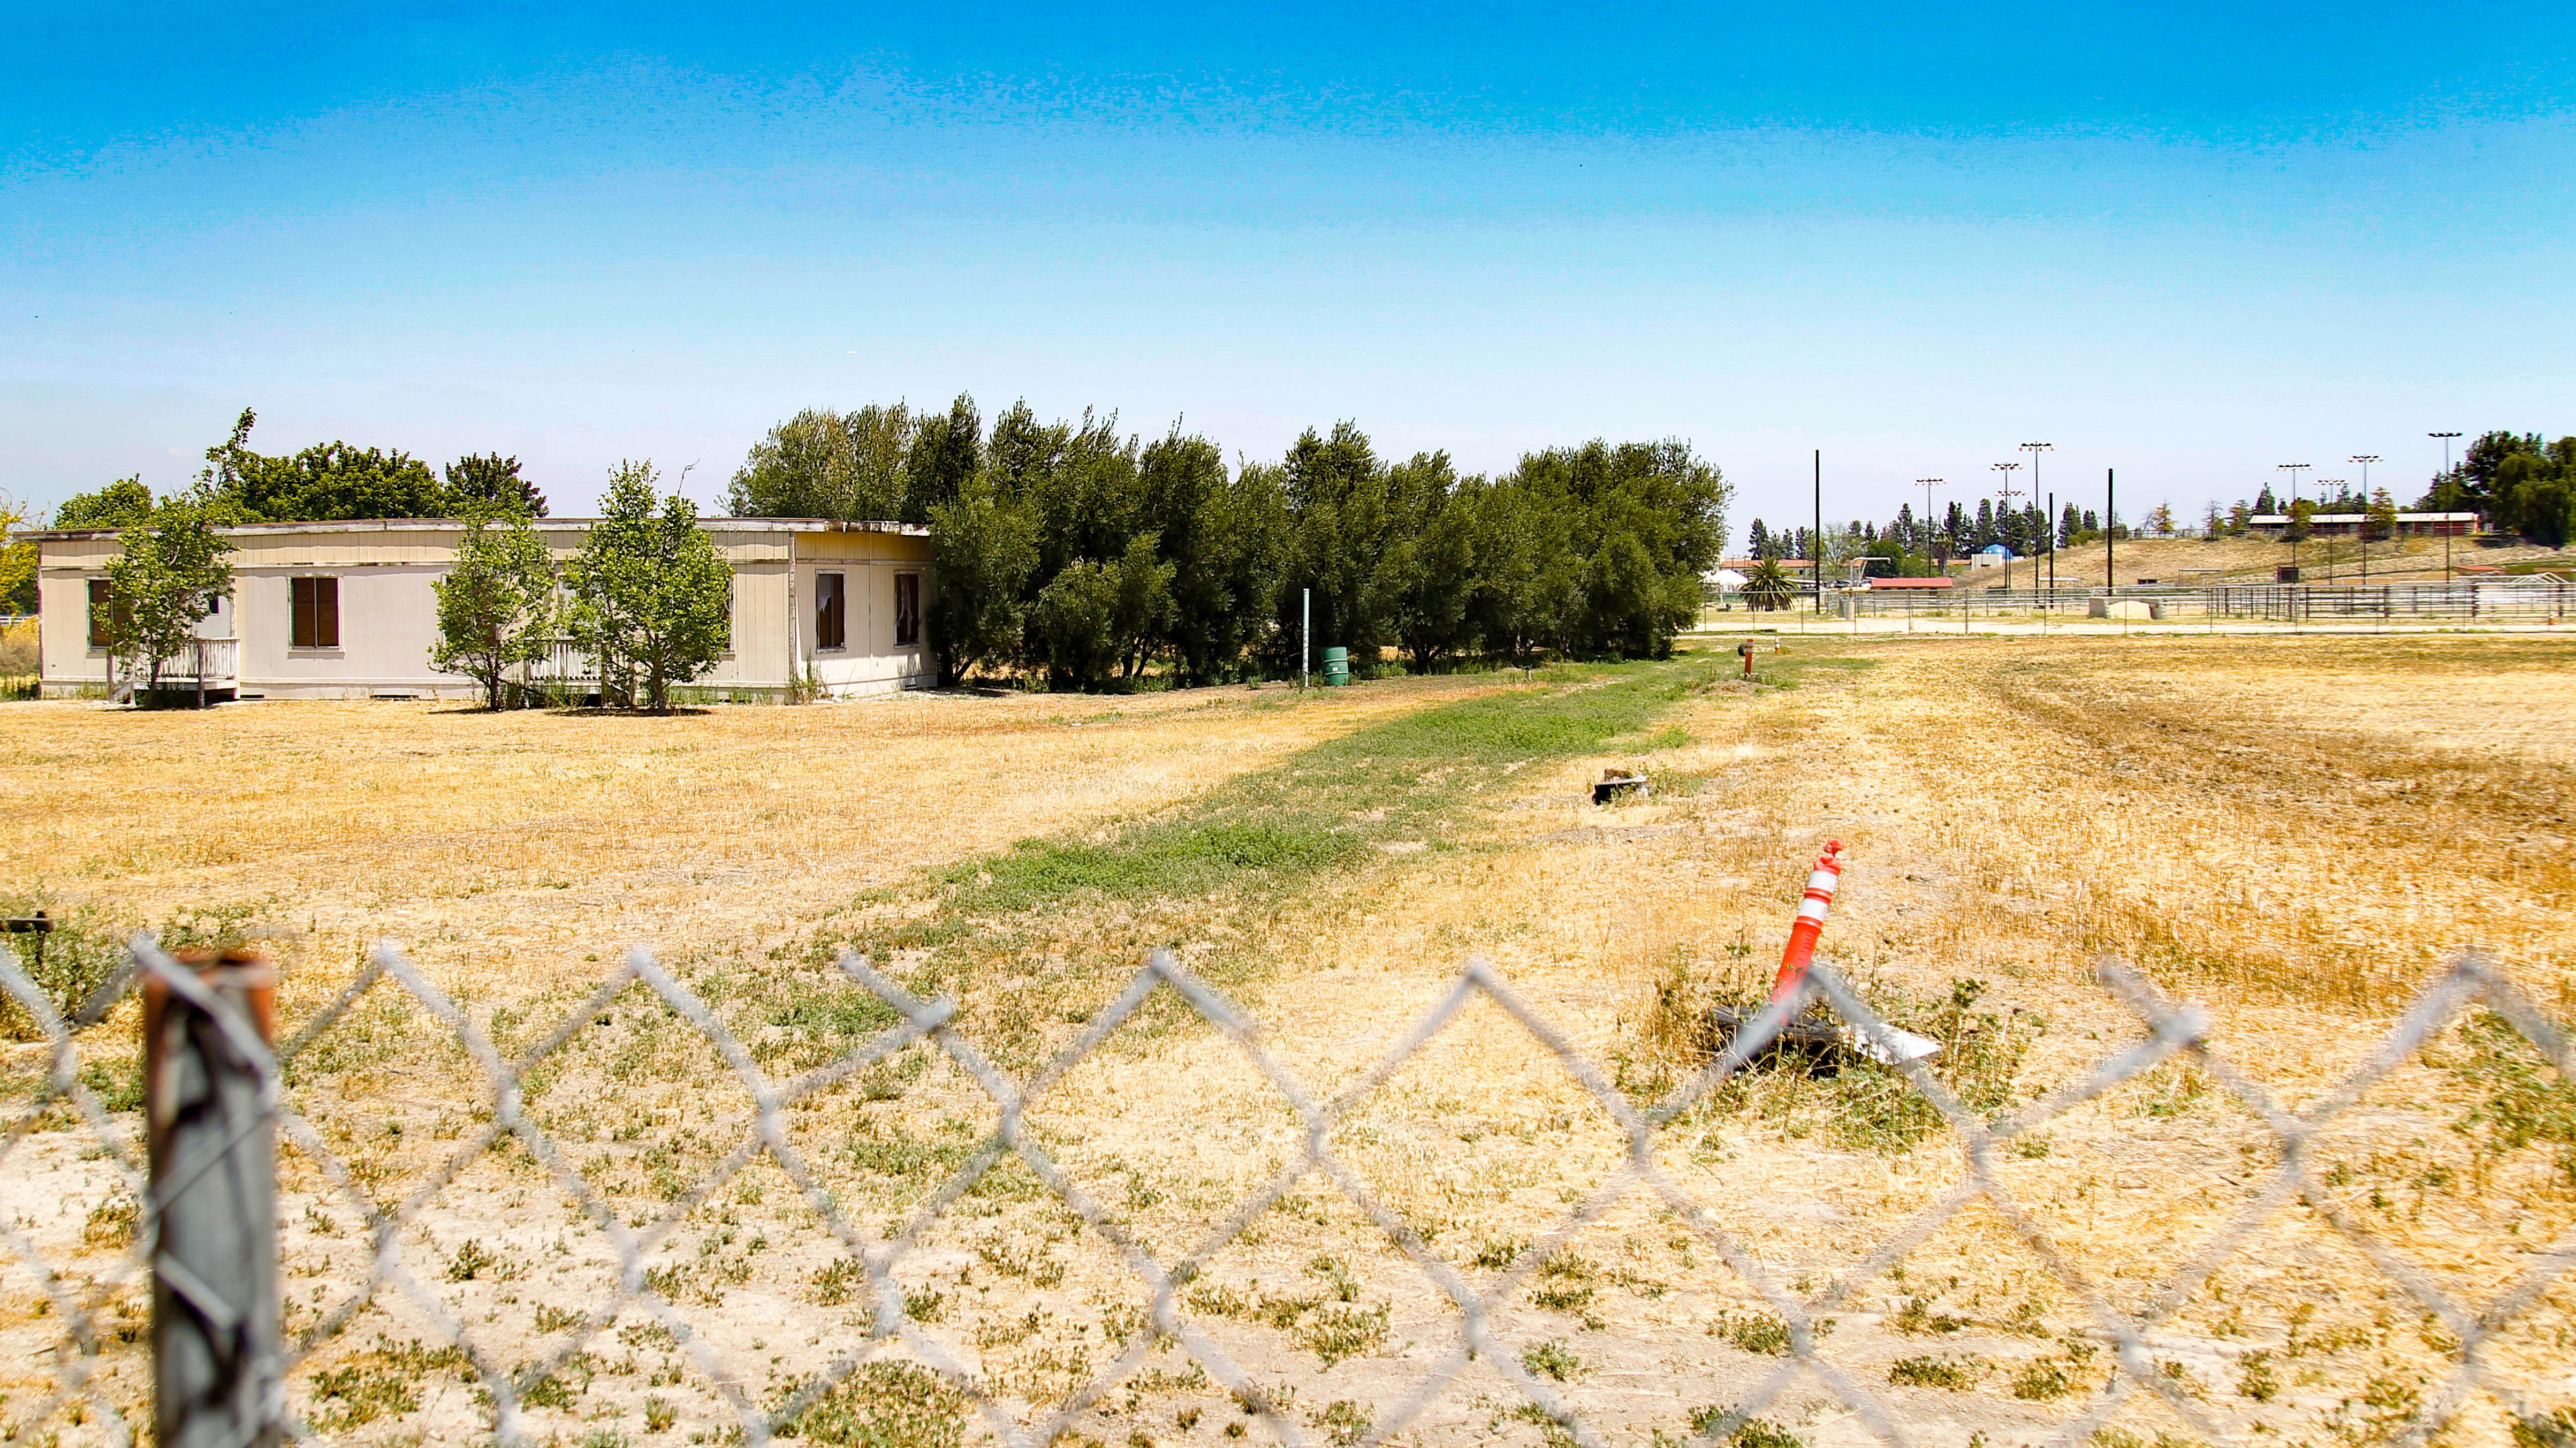 Plans for agricultural center far off